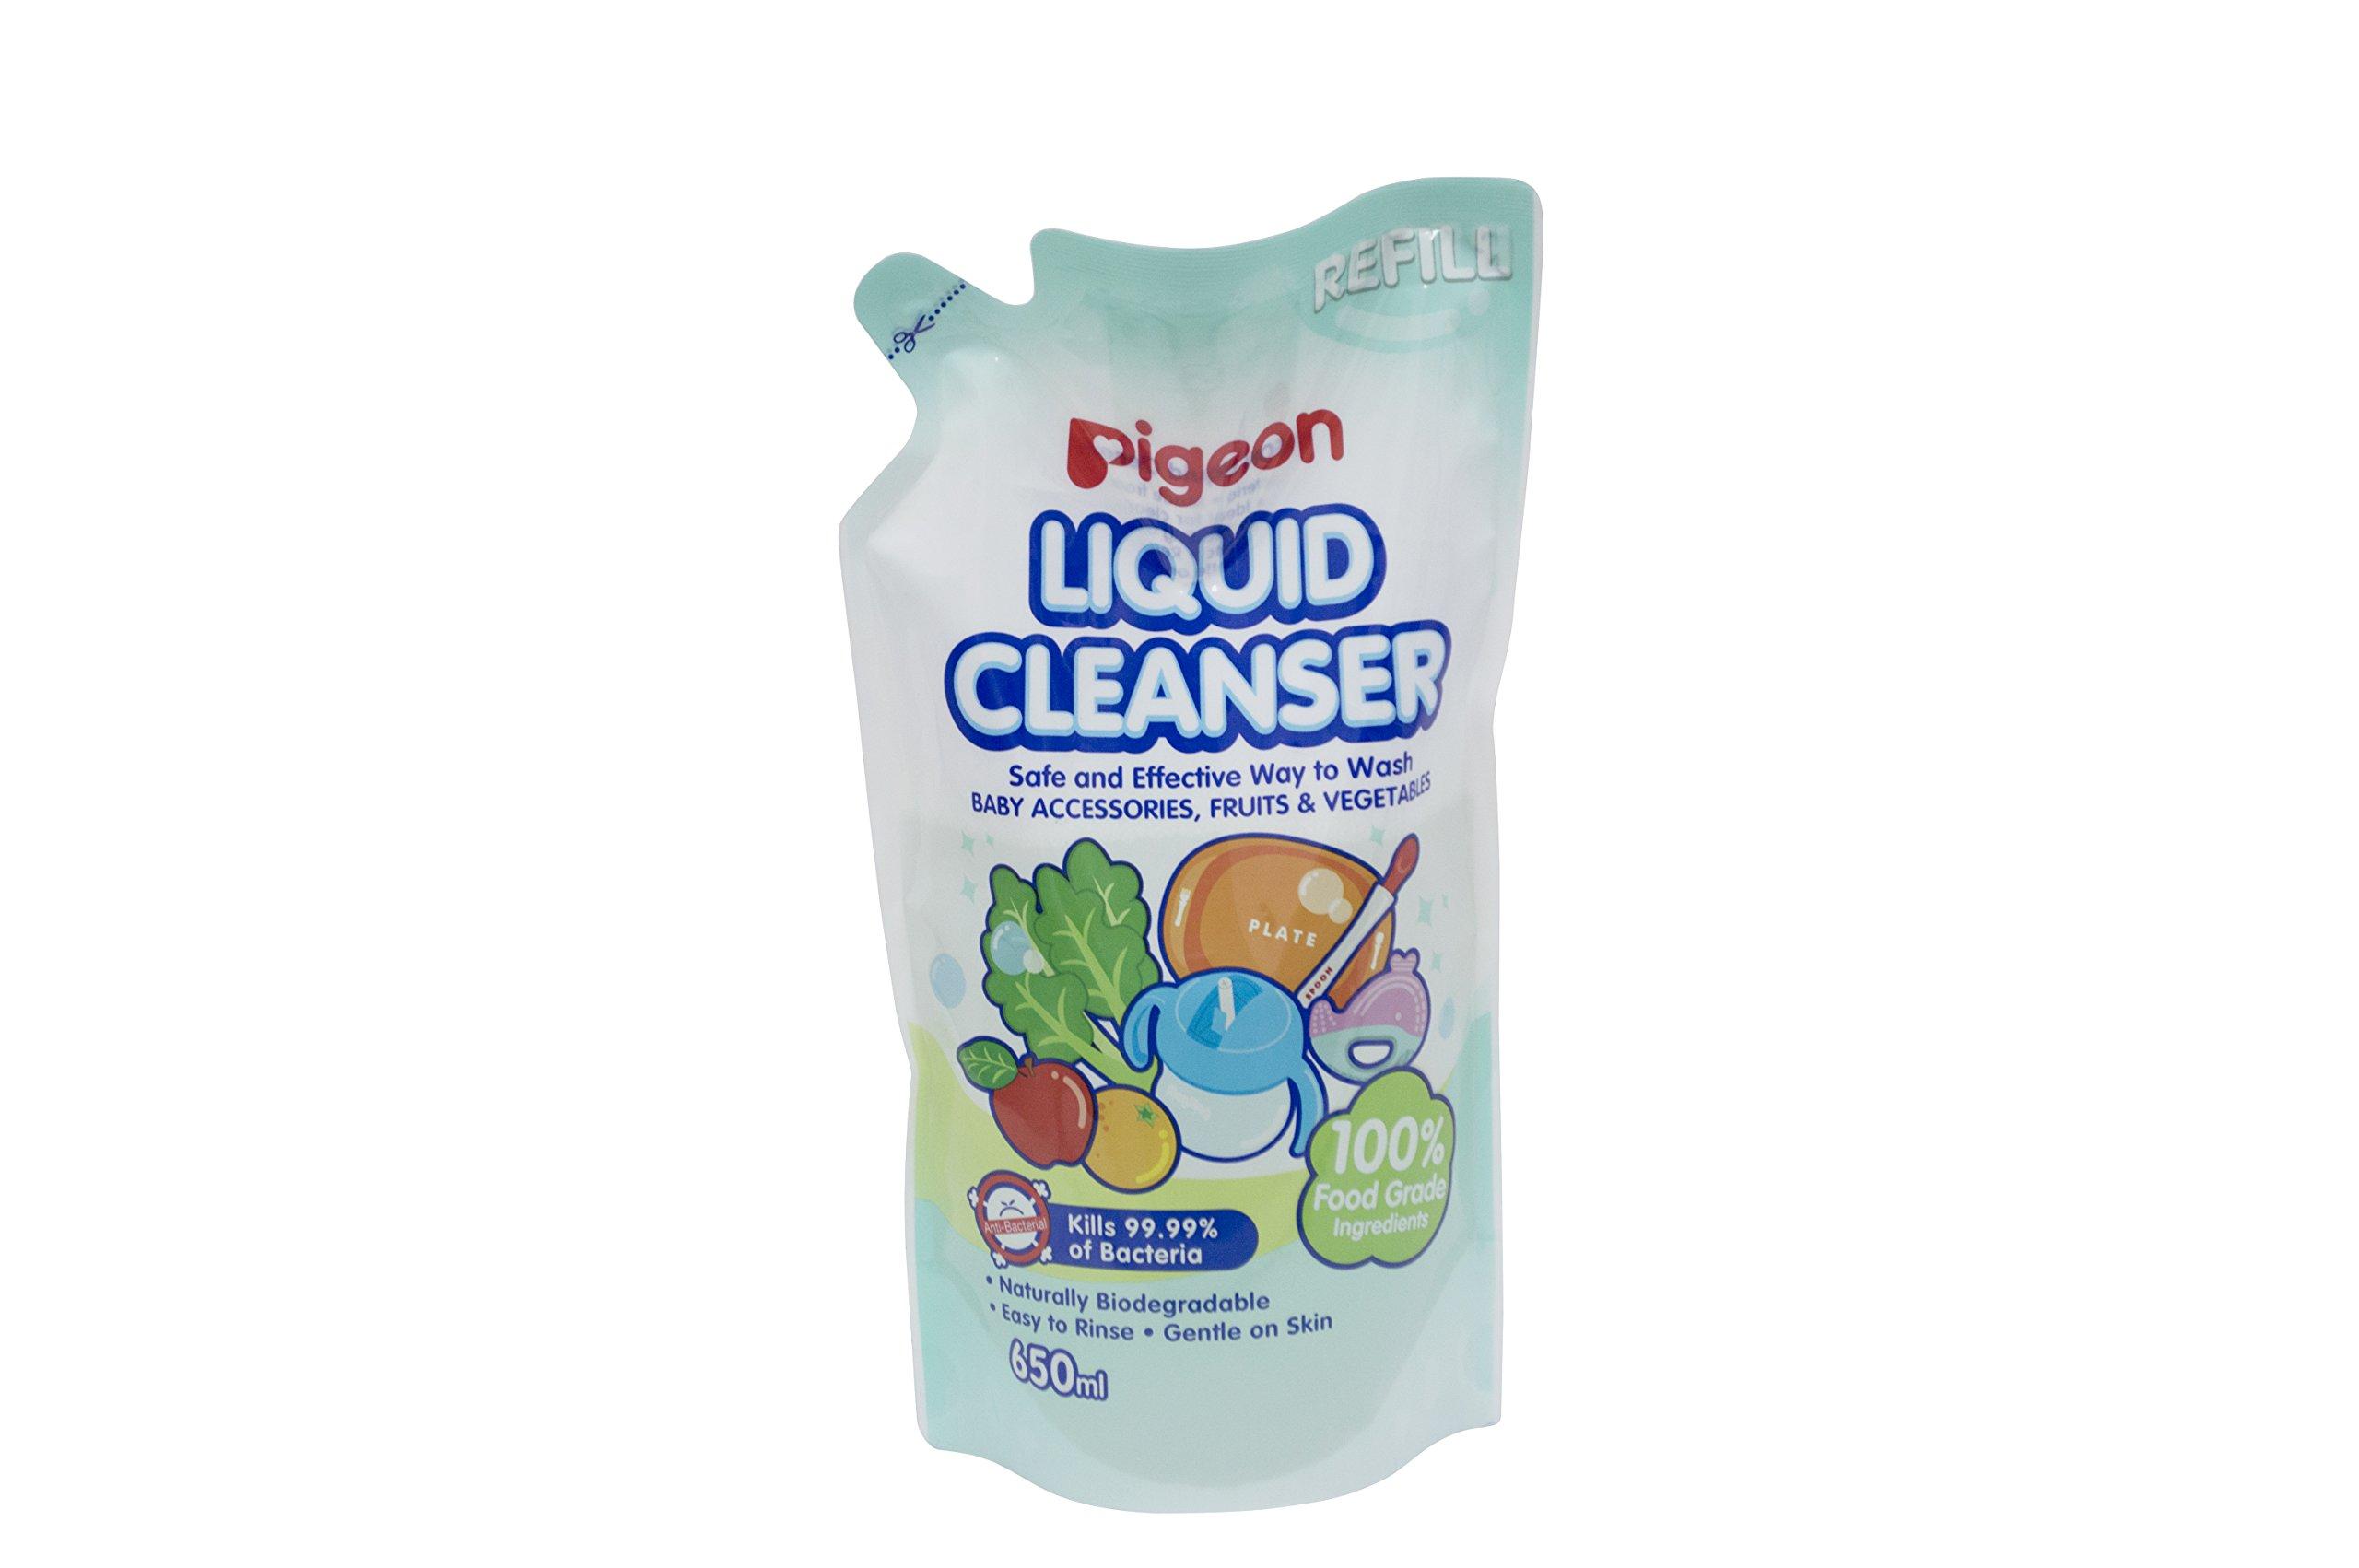 Pigeon 700ml Liquid Cleanser, Refill